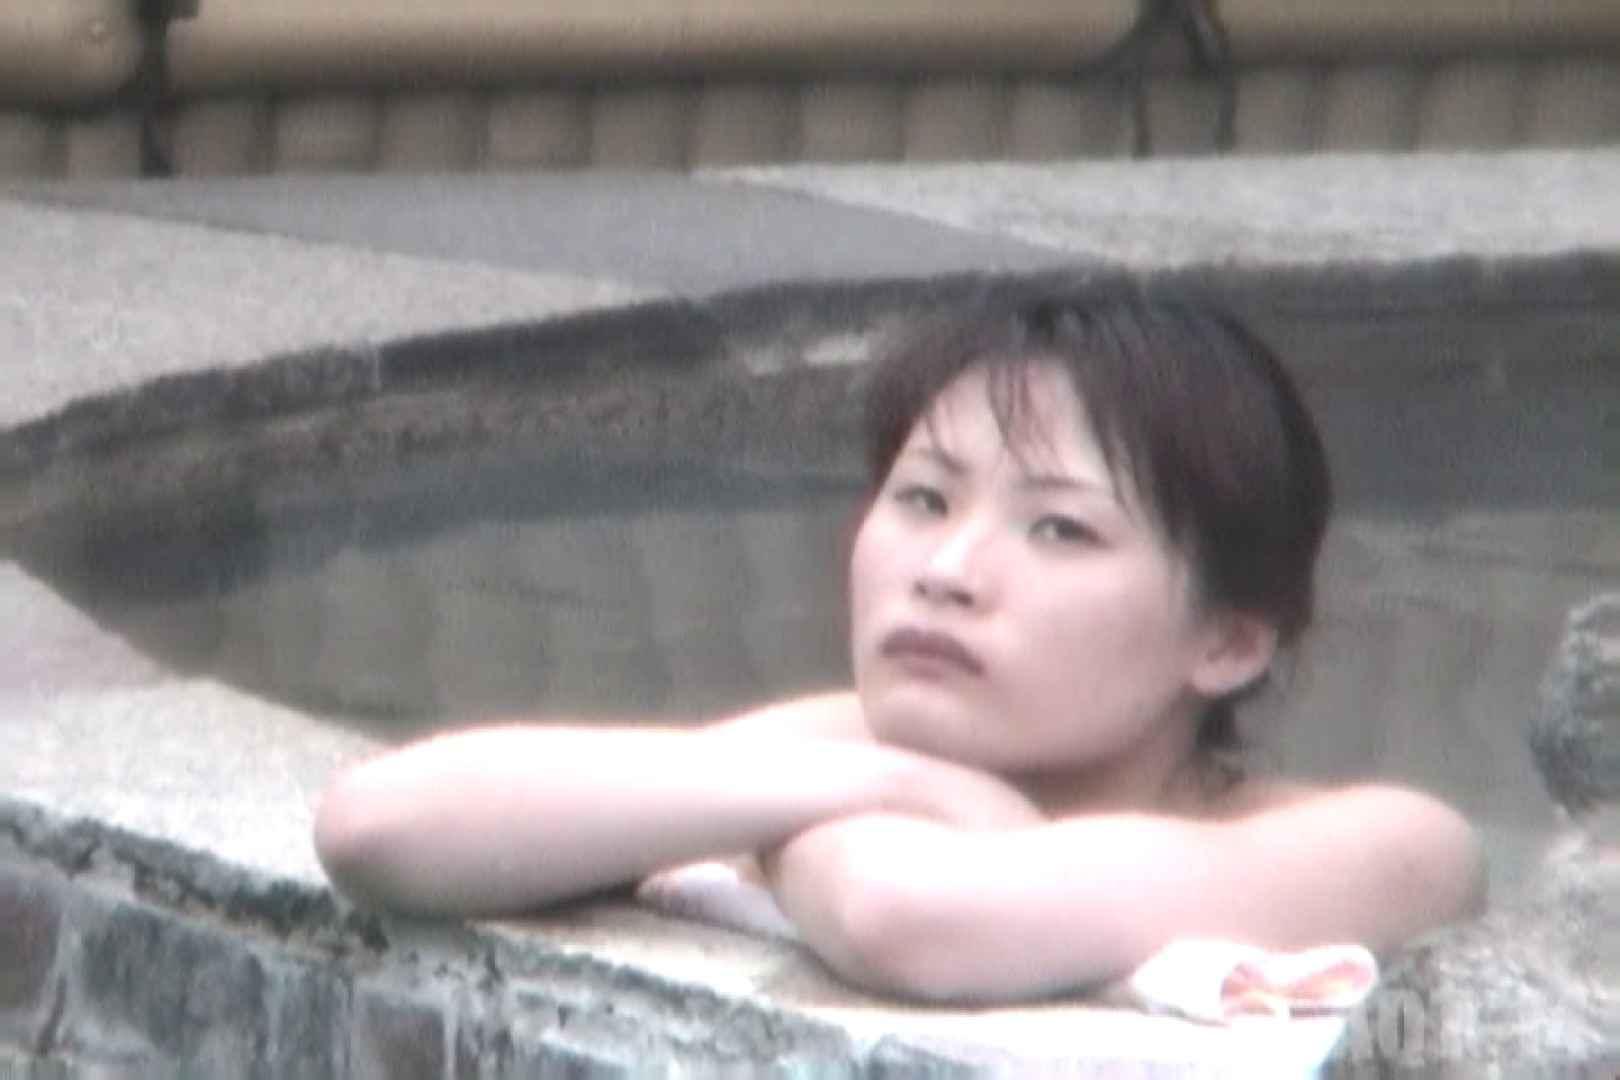 Aquaな露天風呂Vol.822 盗撮シリーズ | 露天風呂編  78PIX 27